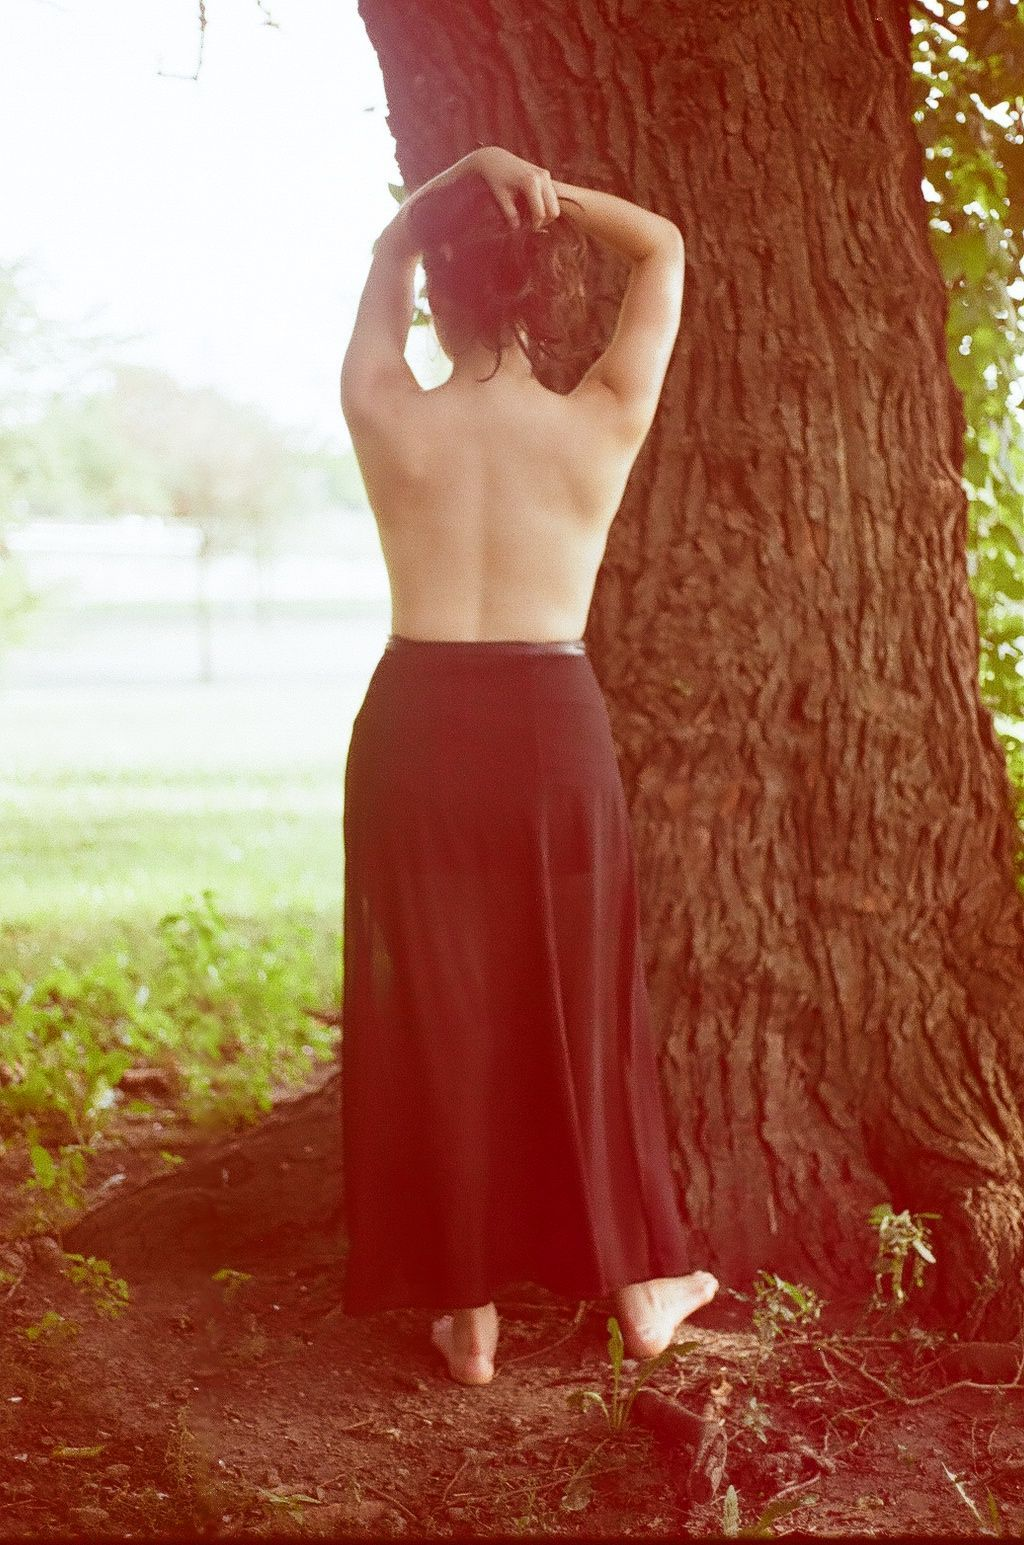 Boobs Simone Kessell  nude (64 pics), Facebook, cameltoe